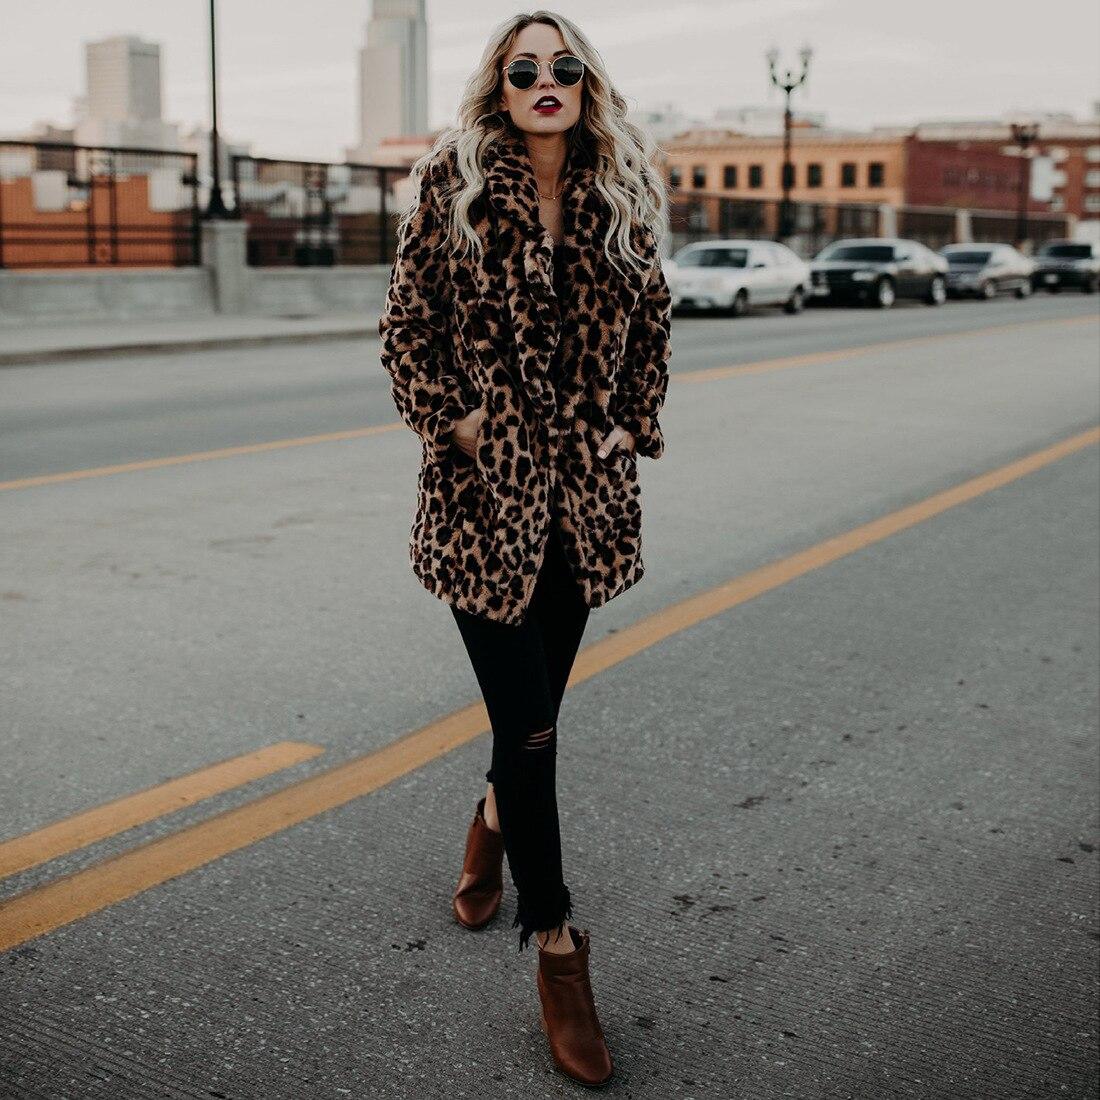 0  Fashion Women s Leopard Faux Fur Coat Turn down Collar Warm Long Coats  Female Winter Plus Size Casual Outerwear-in Faux Fur from Women s Clothing    ... 37548c35e